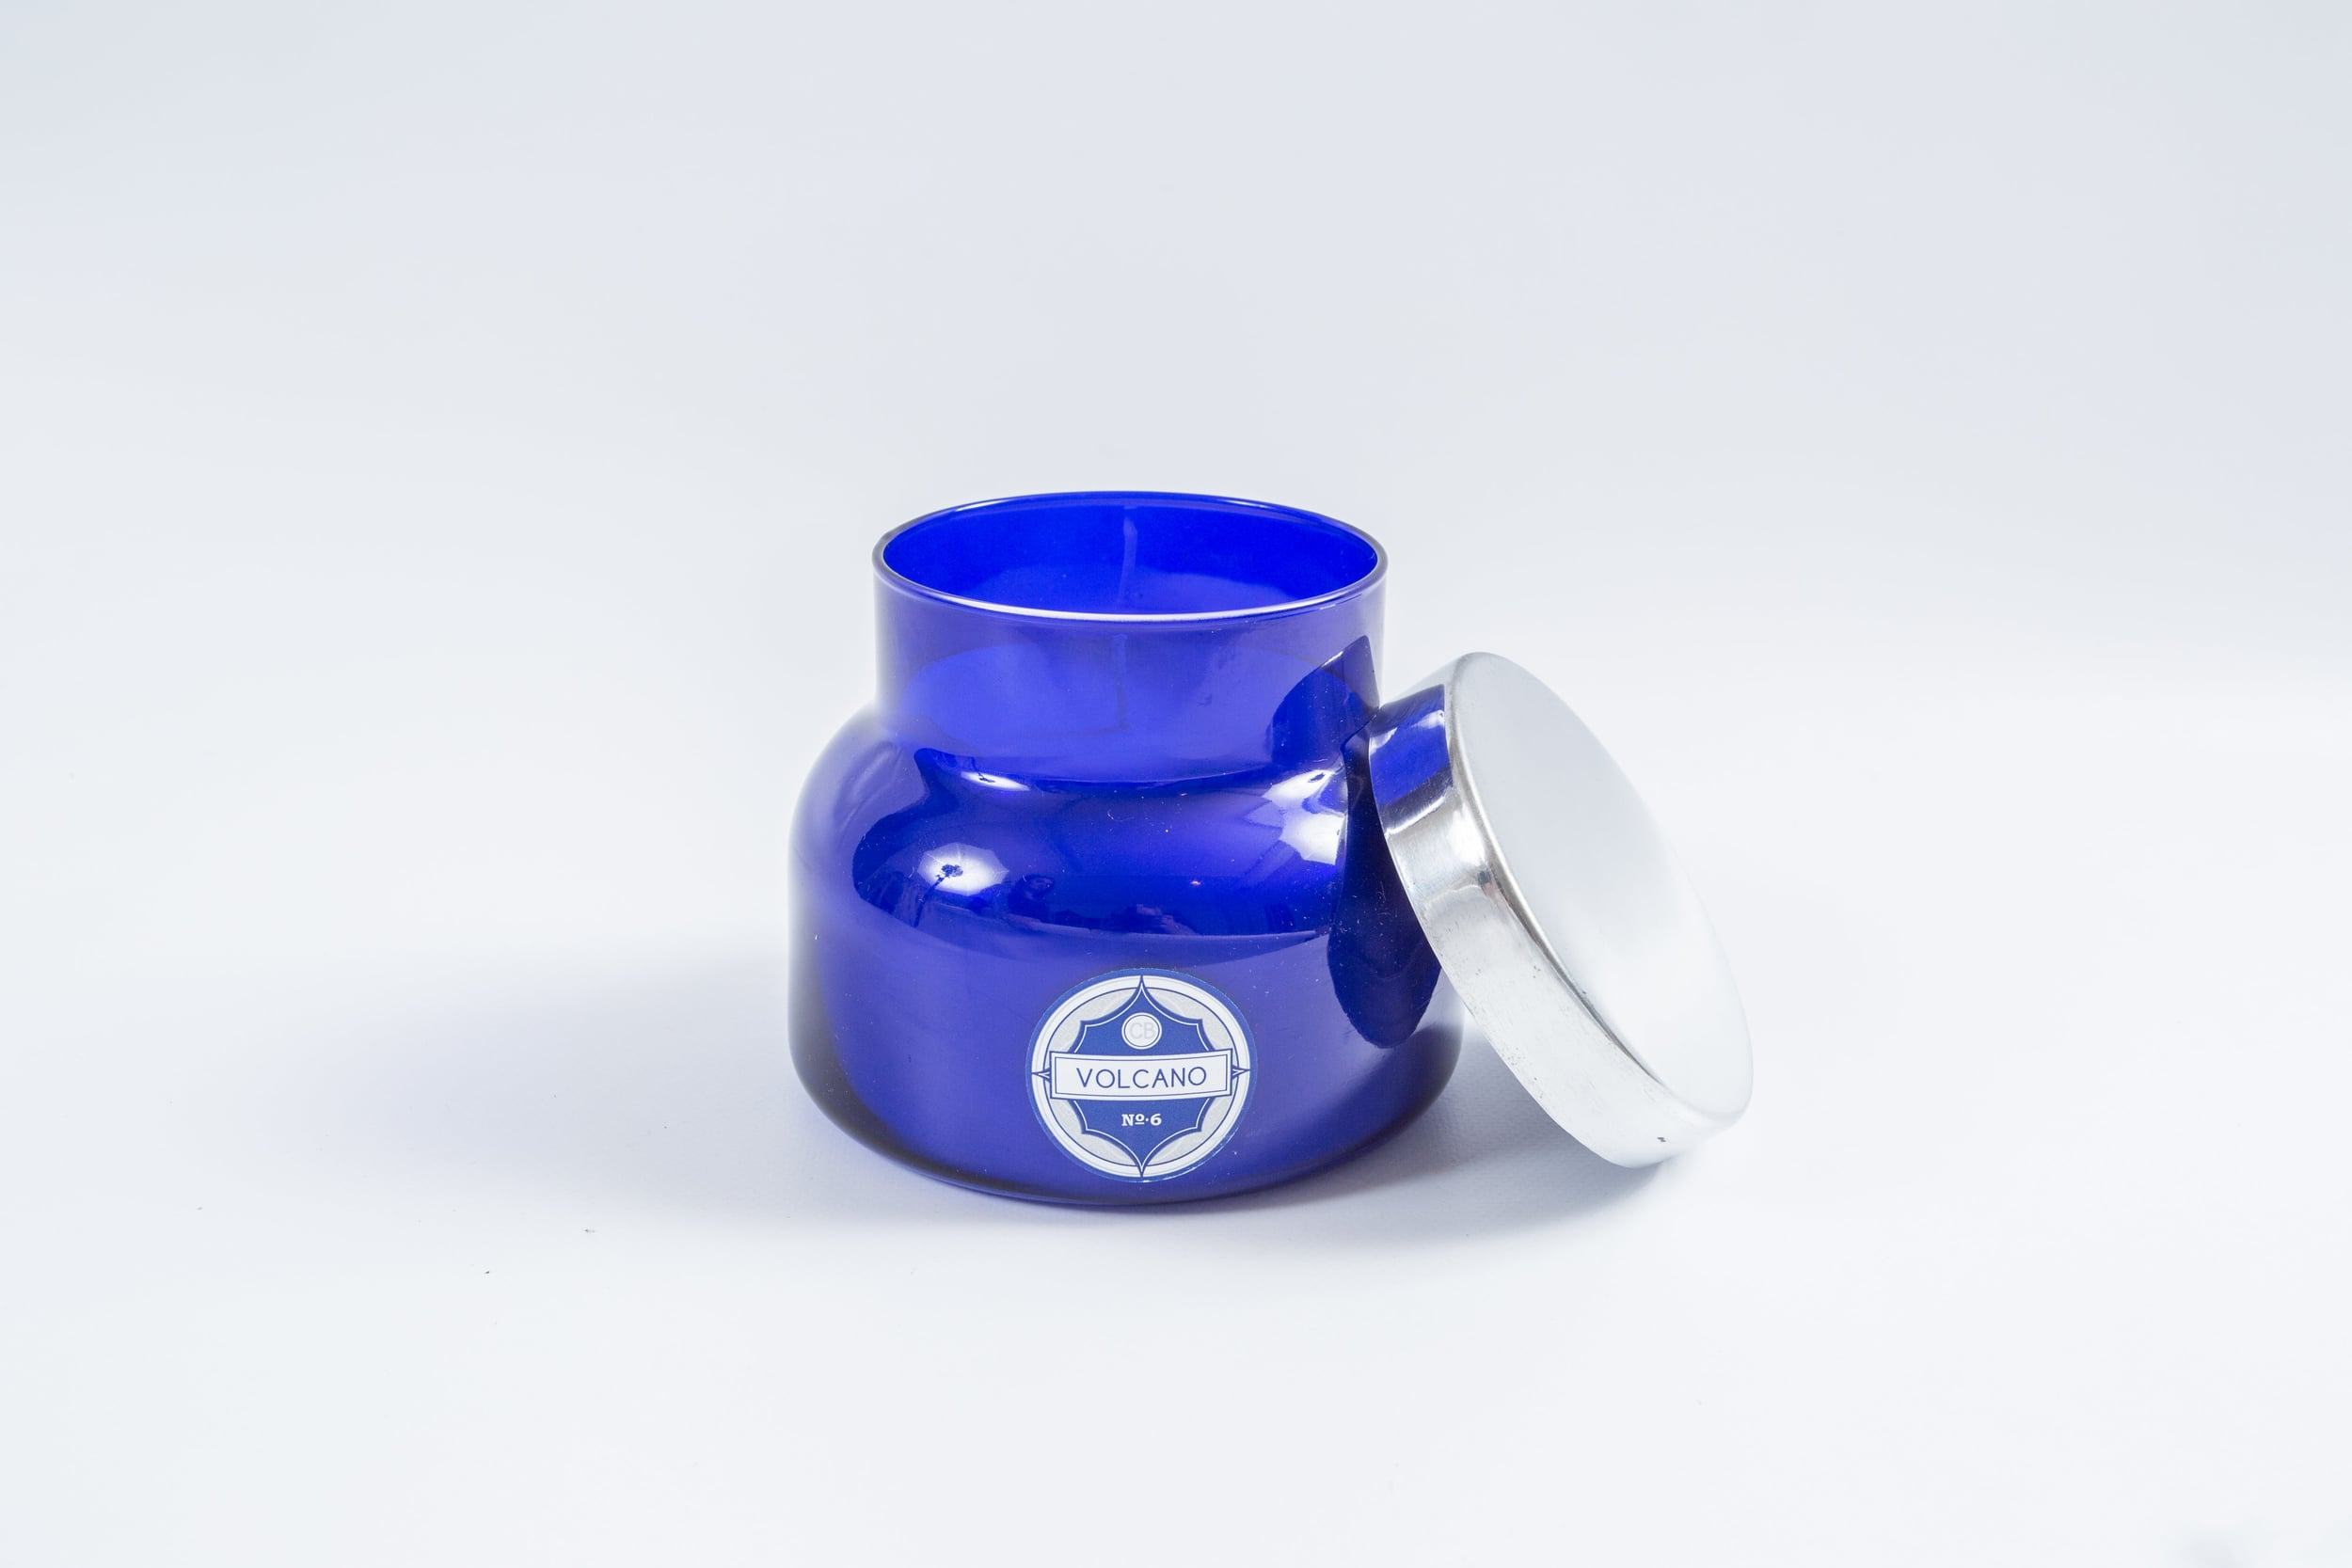 21.5 oz. CAPRI BLUE CANDLE